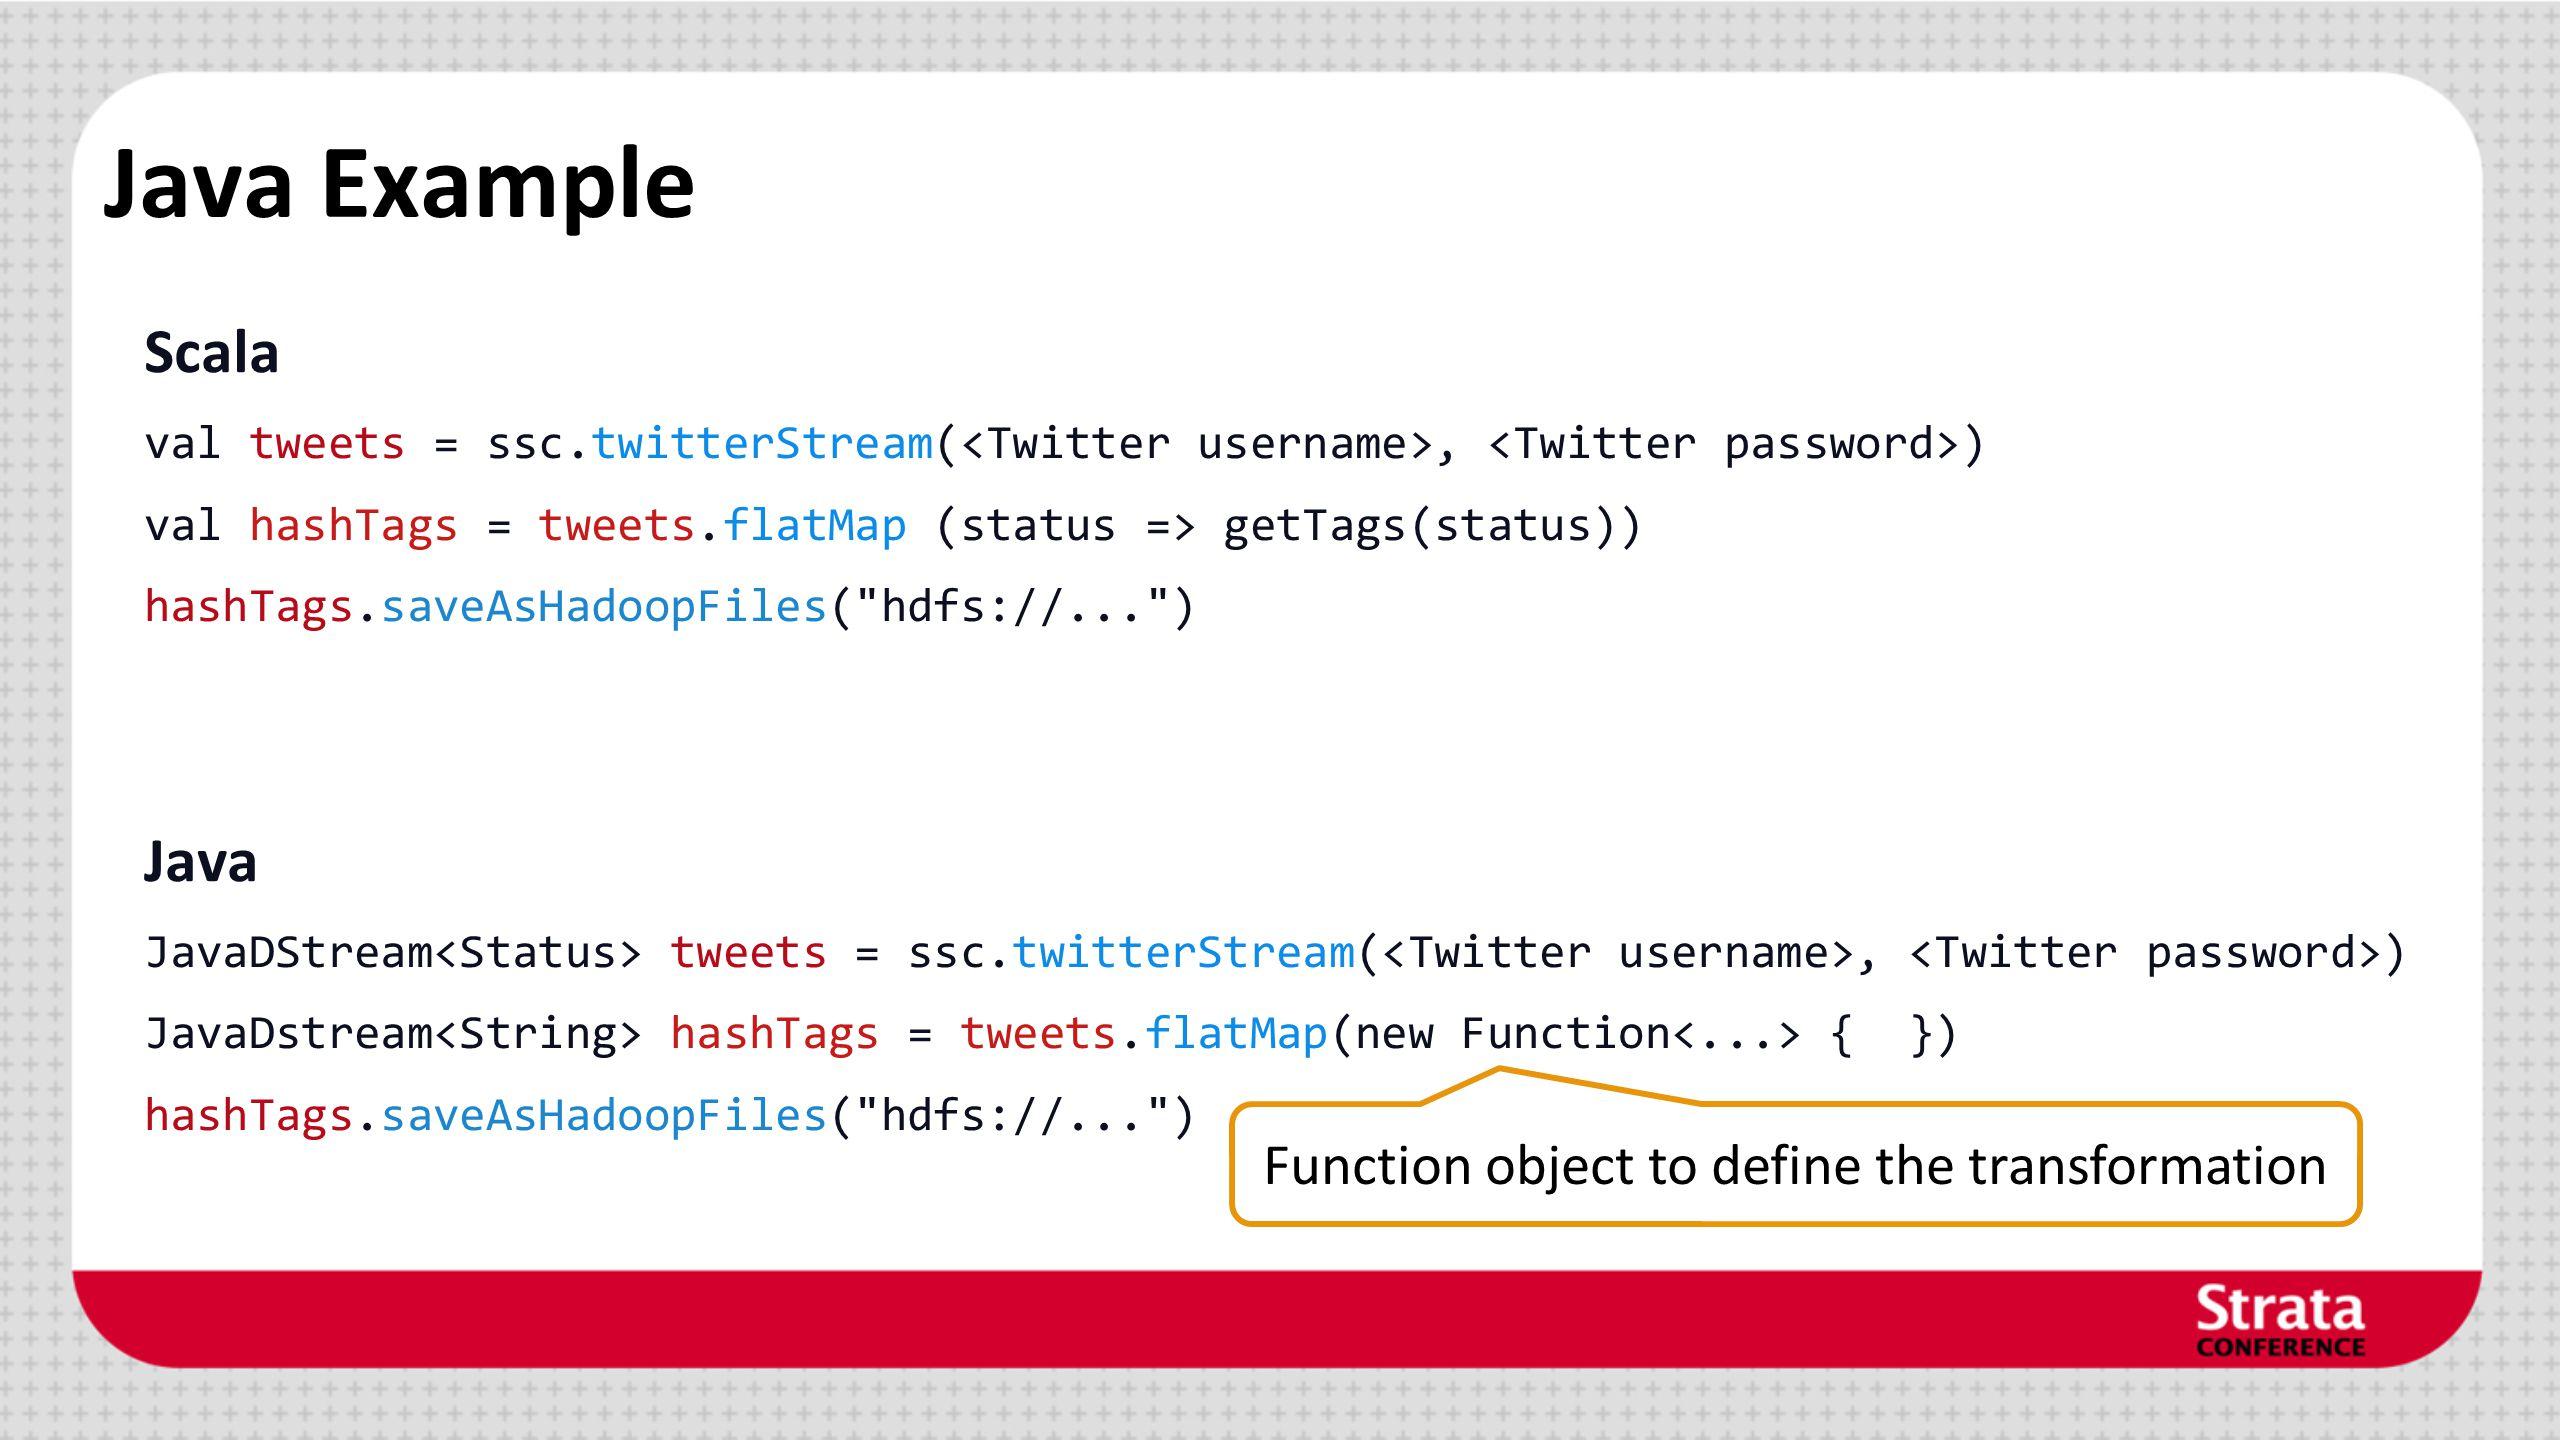 Java Example Scala val tweets = ssc.twitterStream(, ) val hashTags = tweets.flatMap (status => getTags(status)) hashTags.saveAsHadoopFiles(